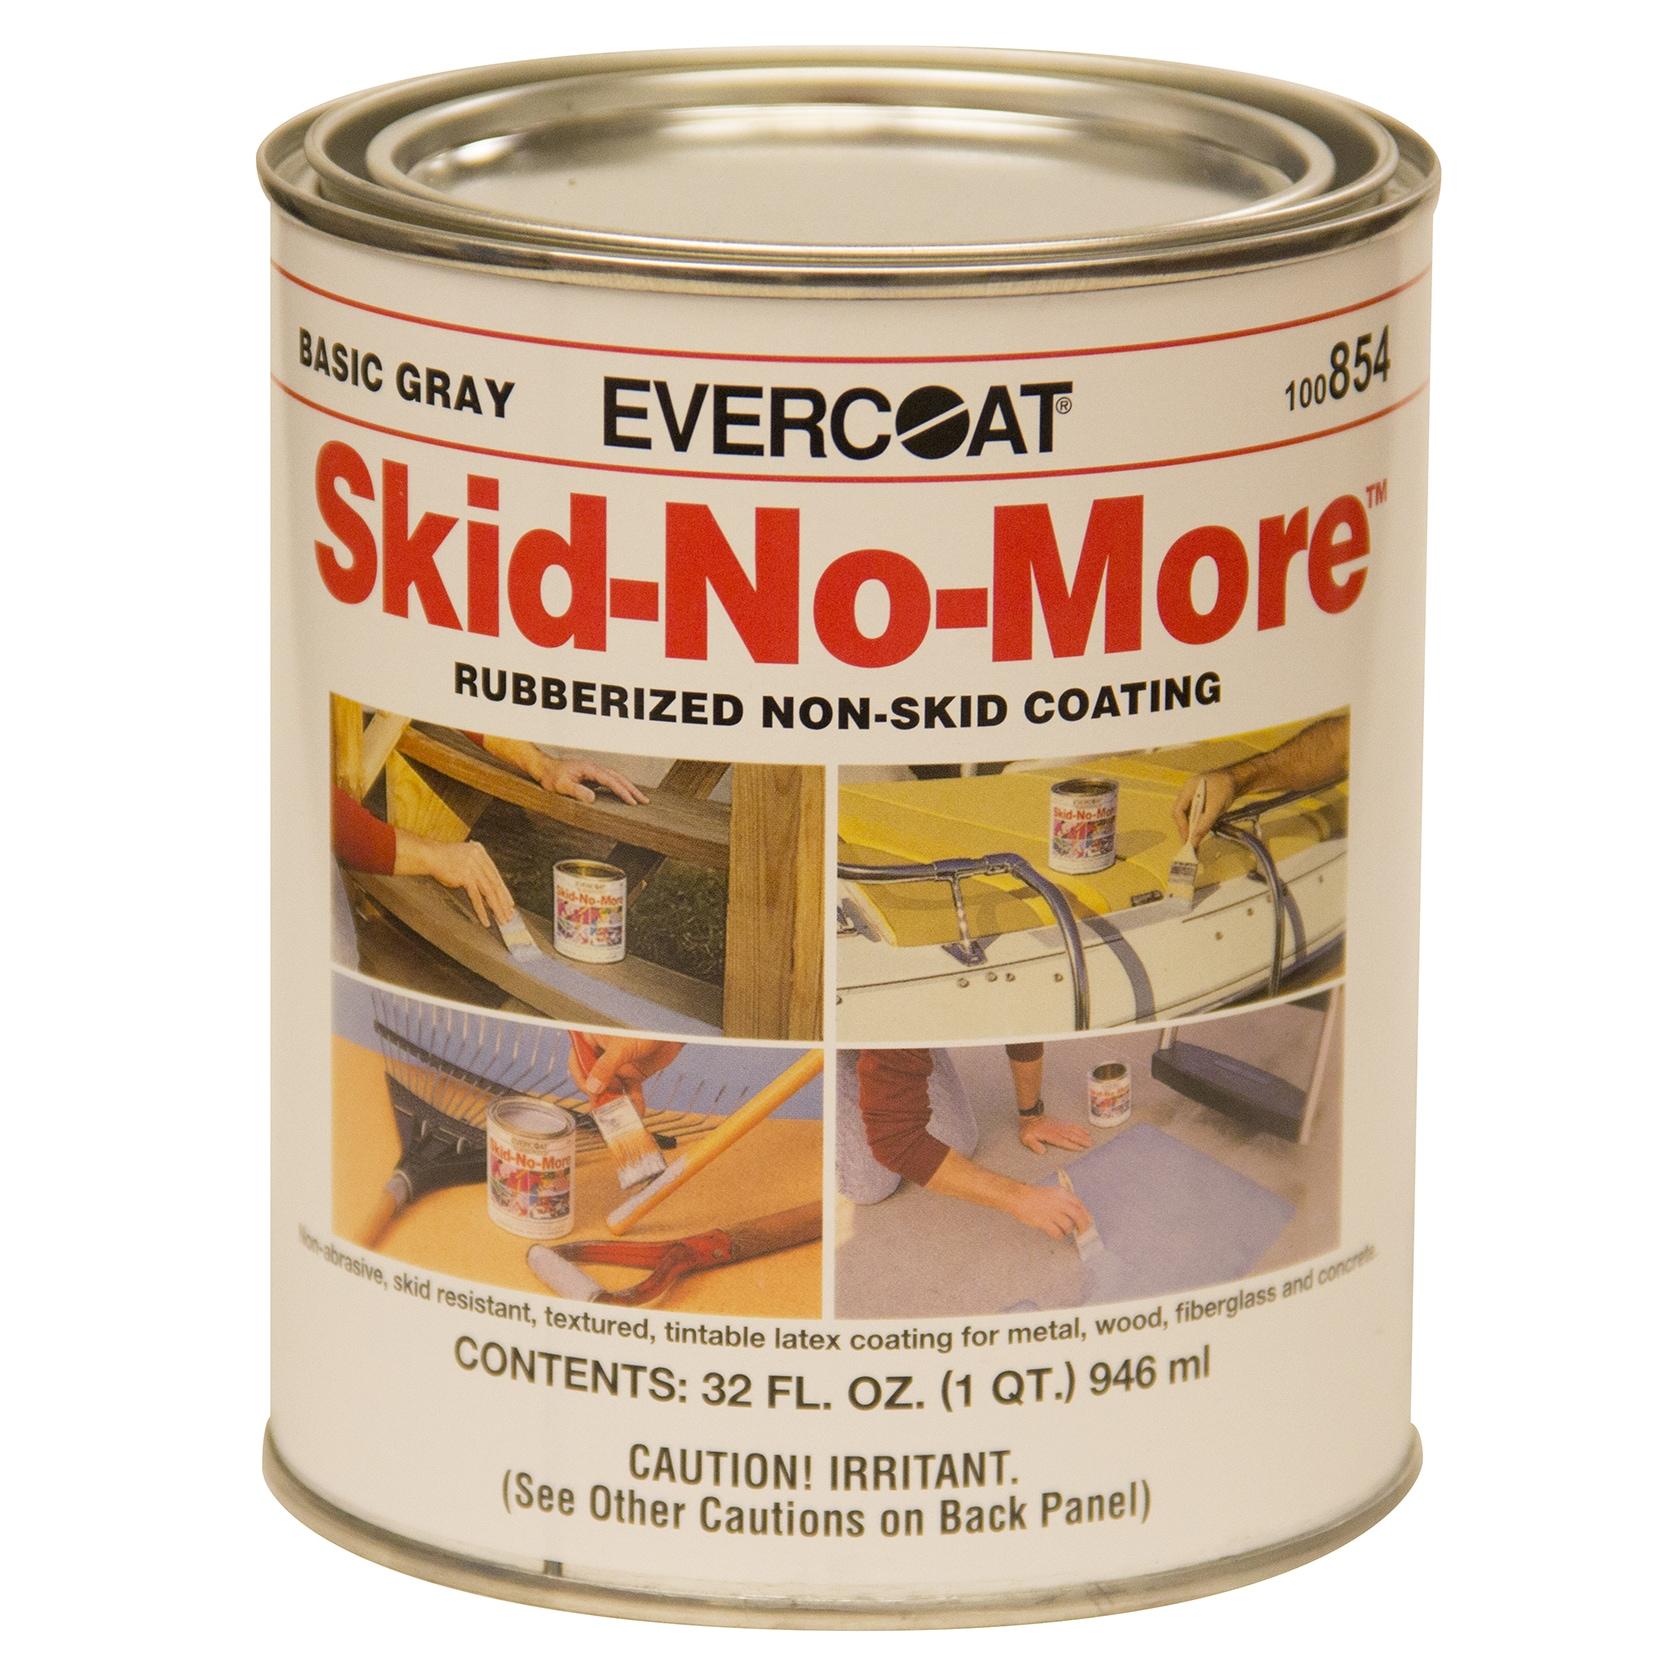 Evercoat 100854 1 Quart Skid-No-More Rubberized Non-Skid ...